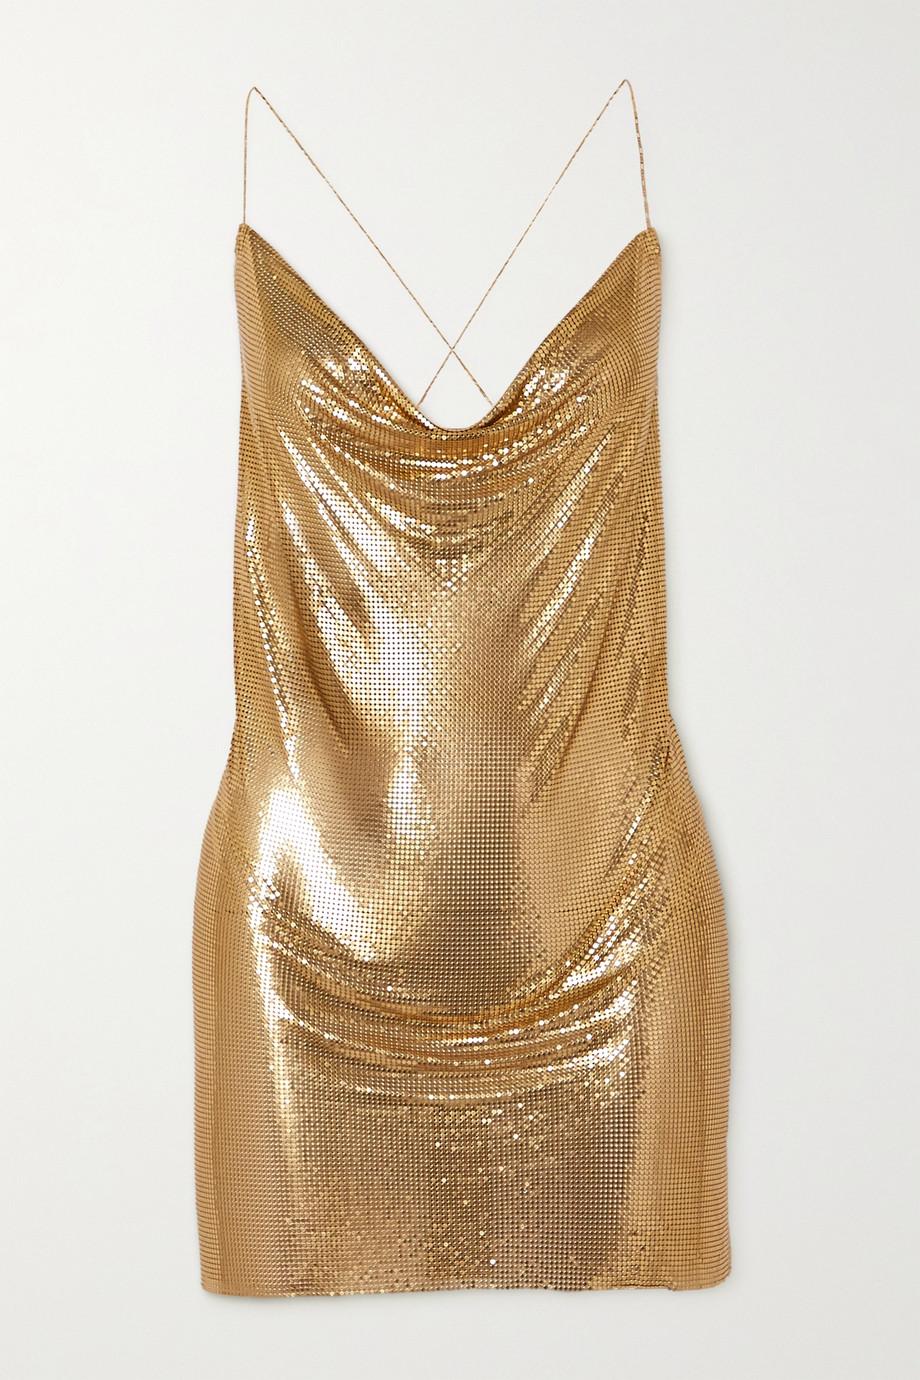 Fannie Schiavoni Zuri open-back chainmail mini dress